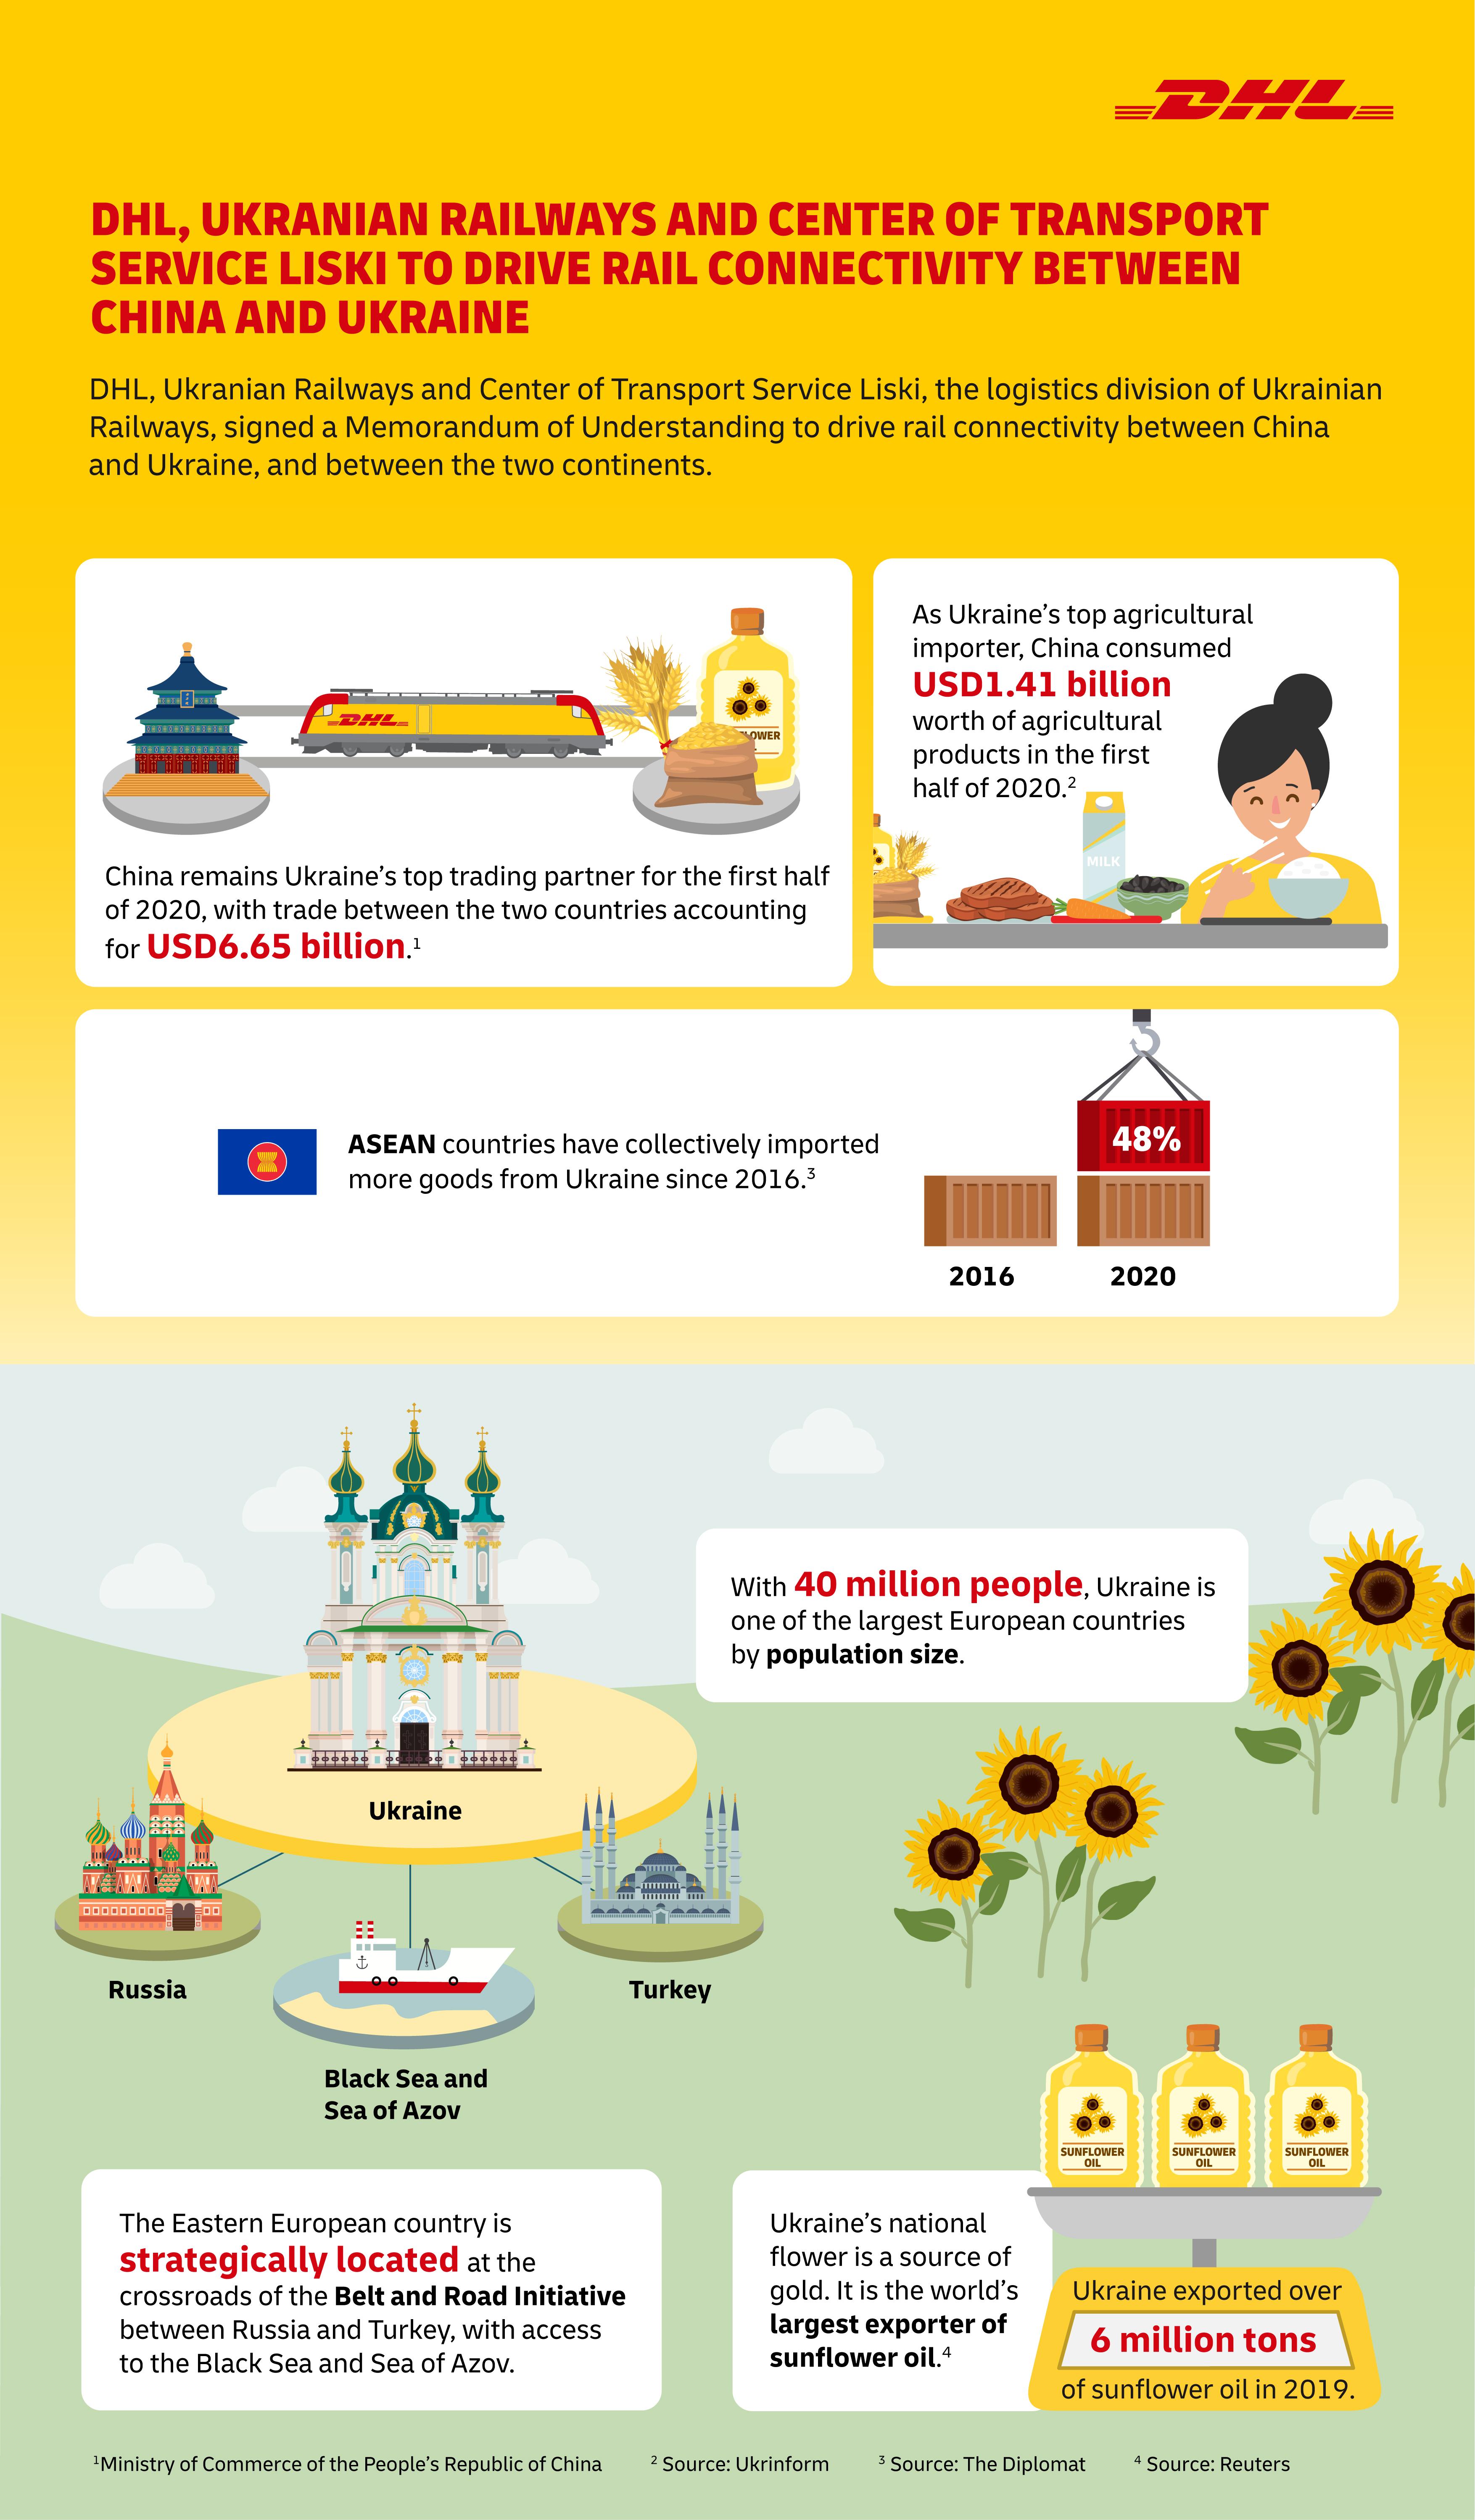 DHL, Ukrainian Railways and Center of Transport Service Liski to drive rail connectivity between China and Ukraine